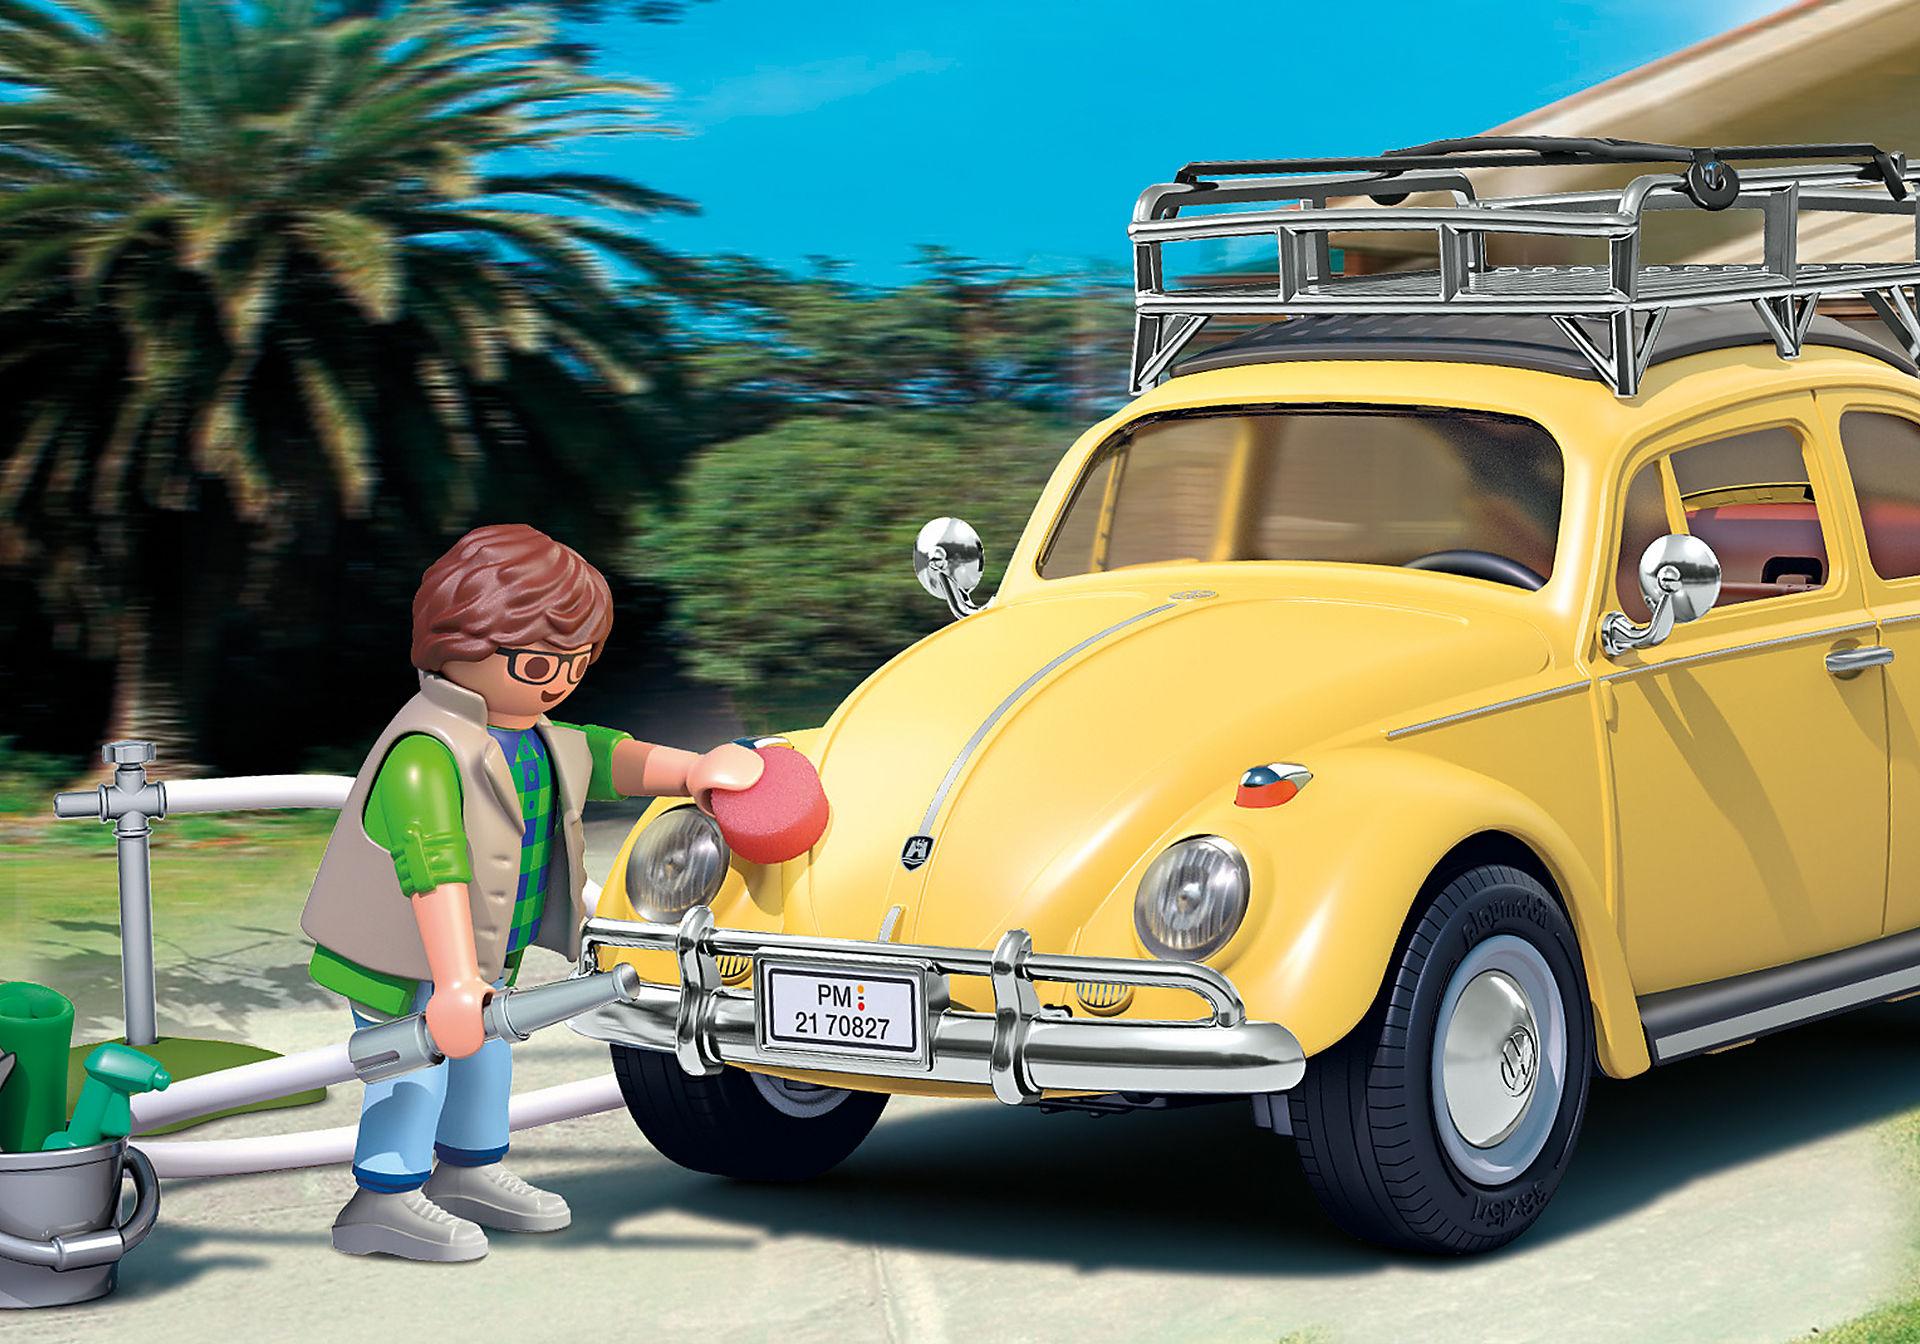 70827 Volkswagen Garbus - Edycja specjalna zoom image7